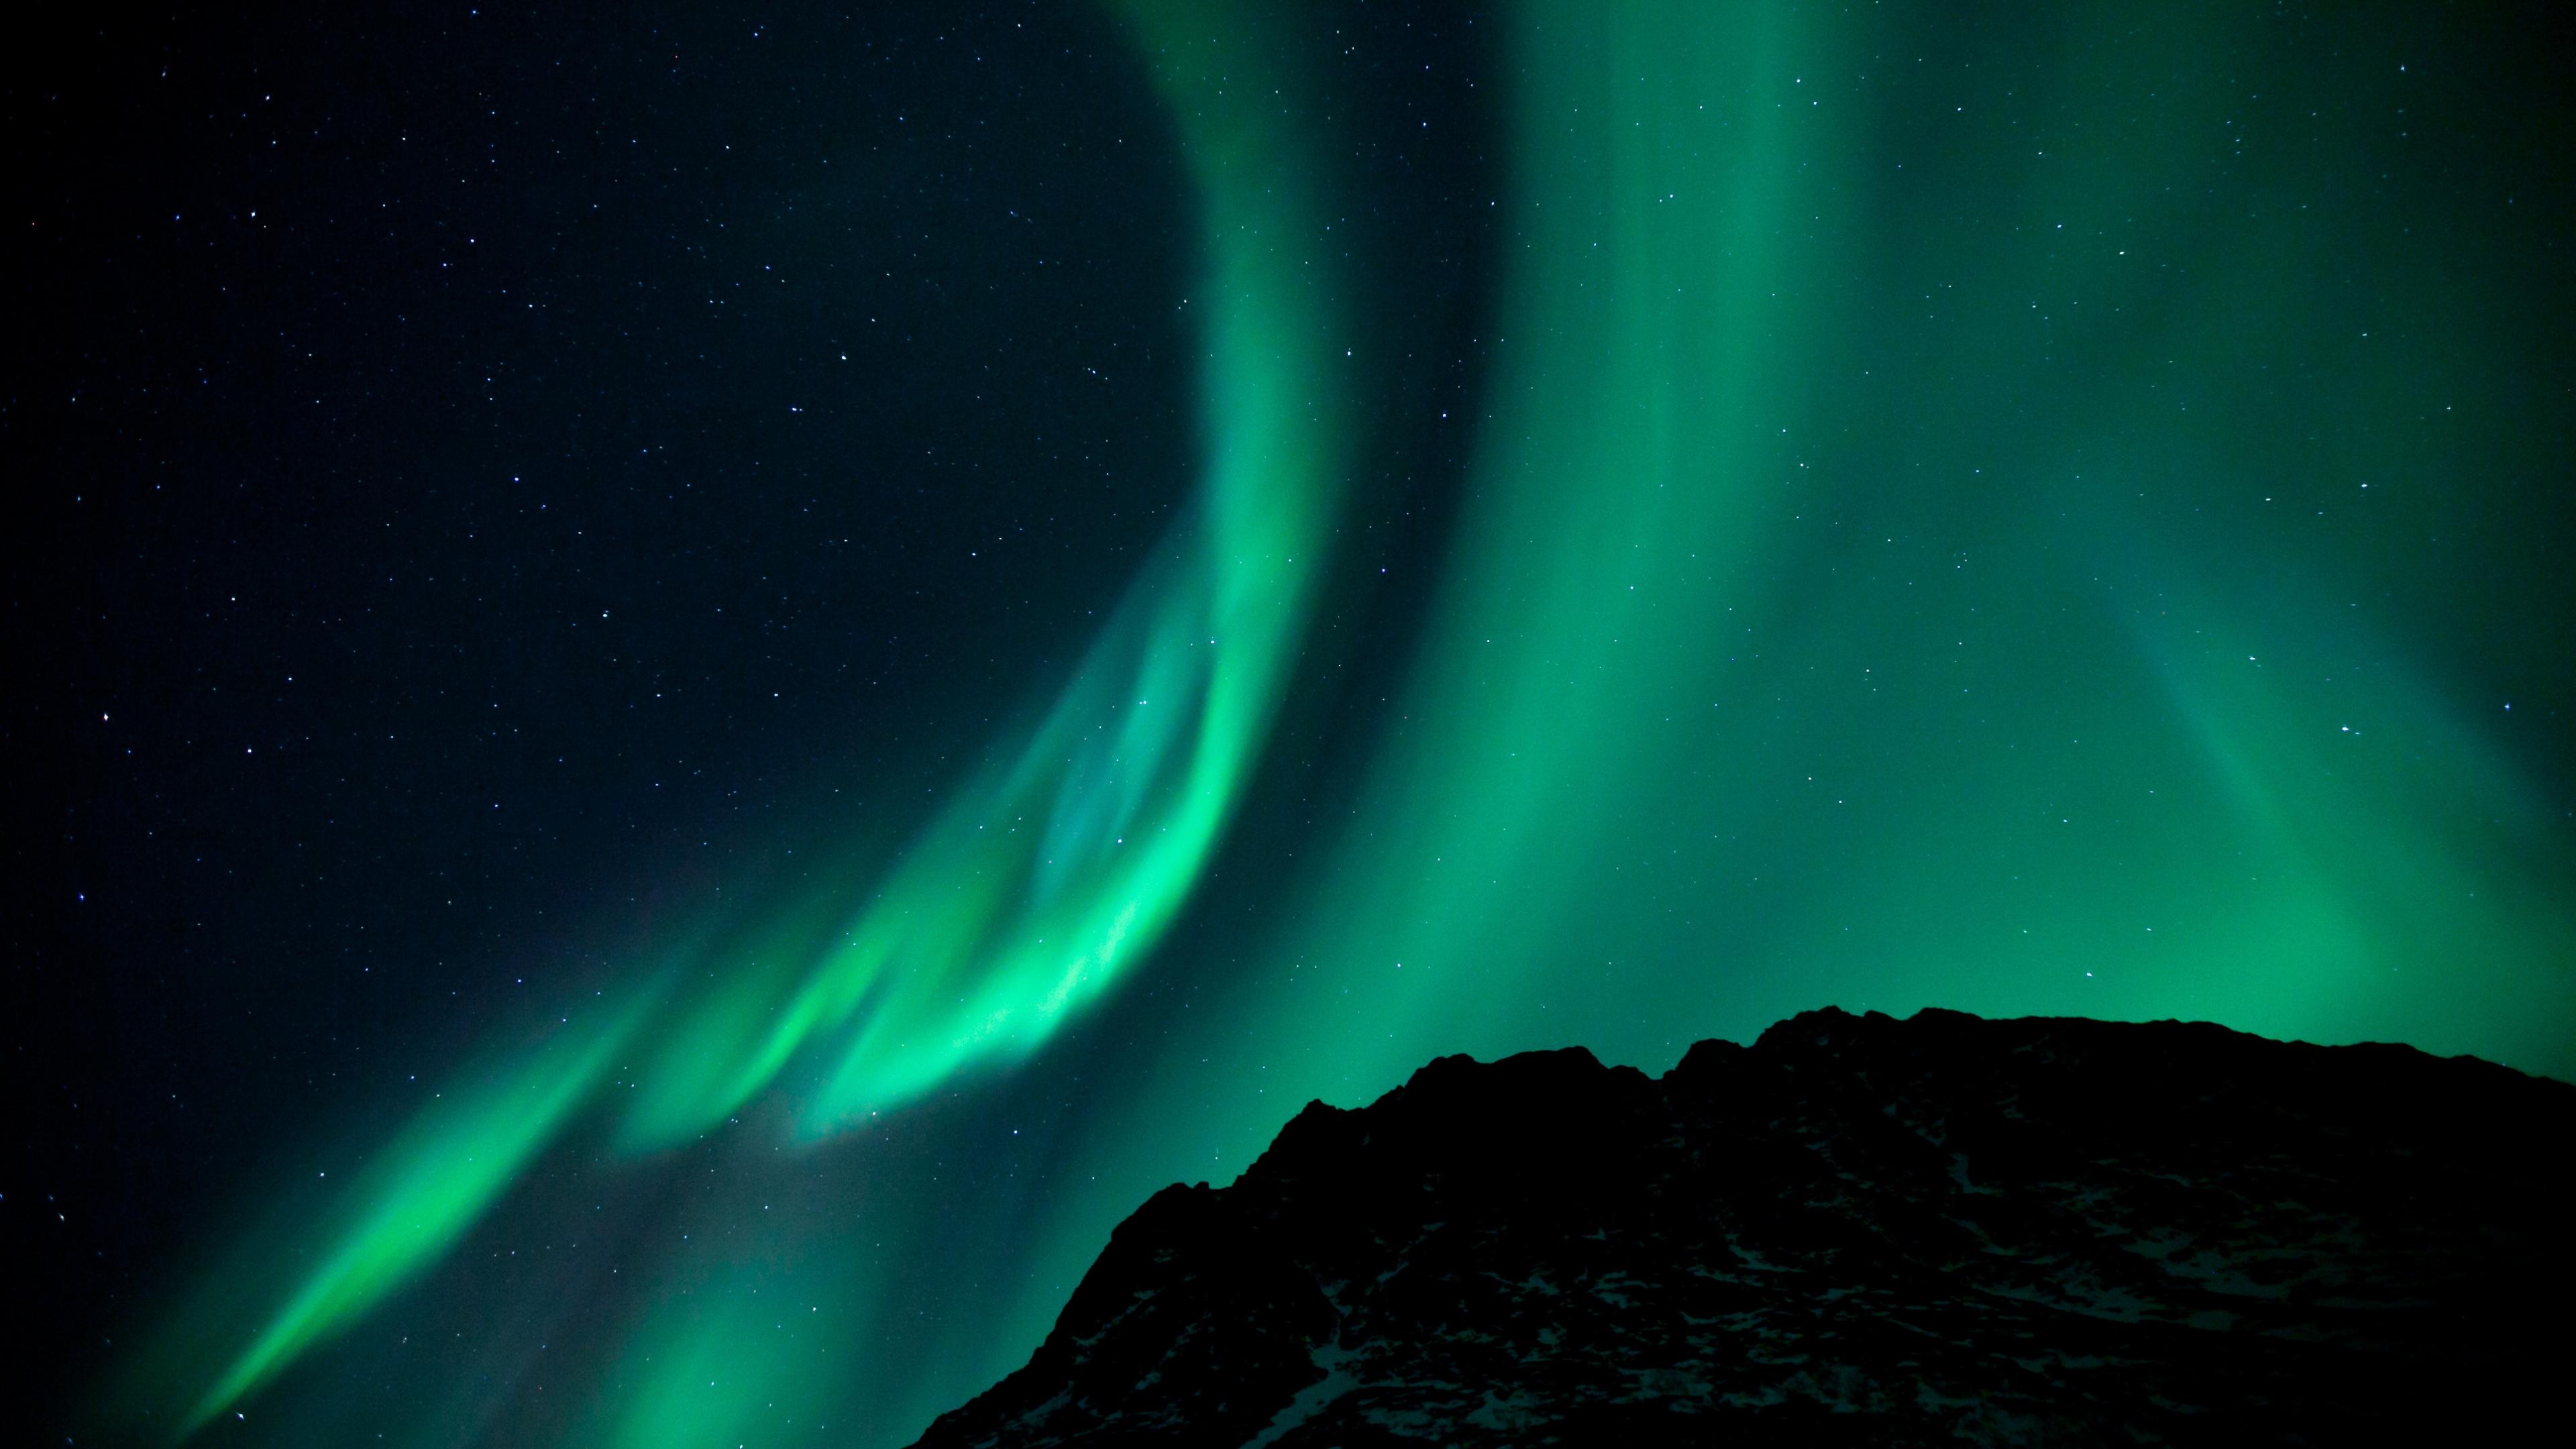 lights Night Night sky phenomenon Wallpaper Background 4K Ultra HD 3840x2160